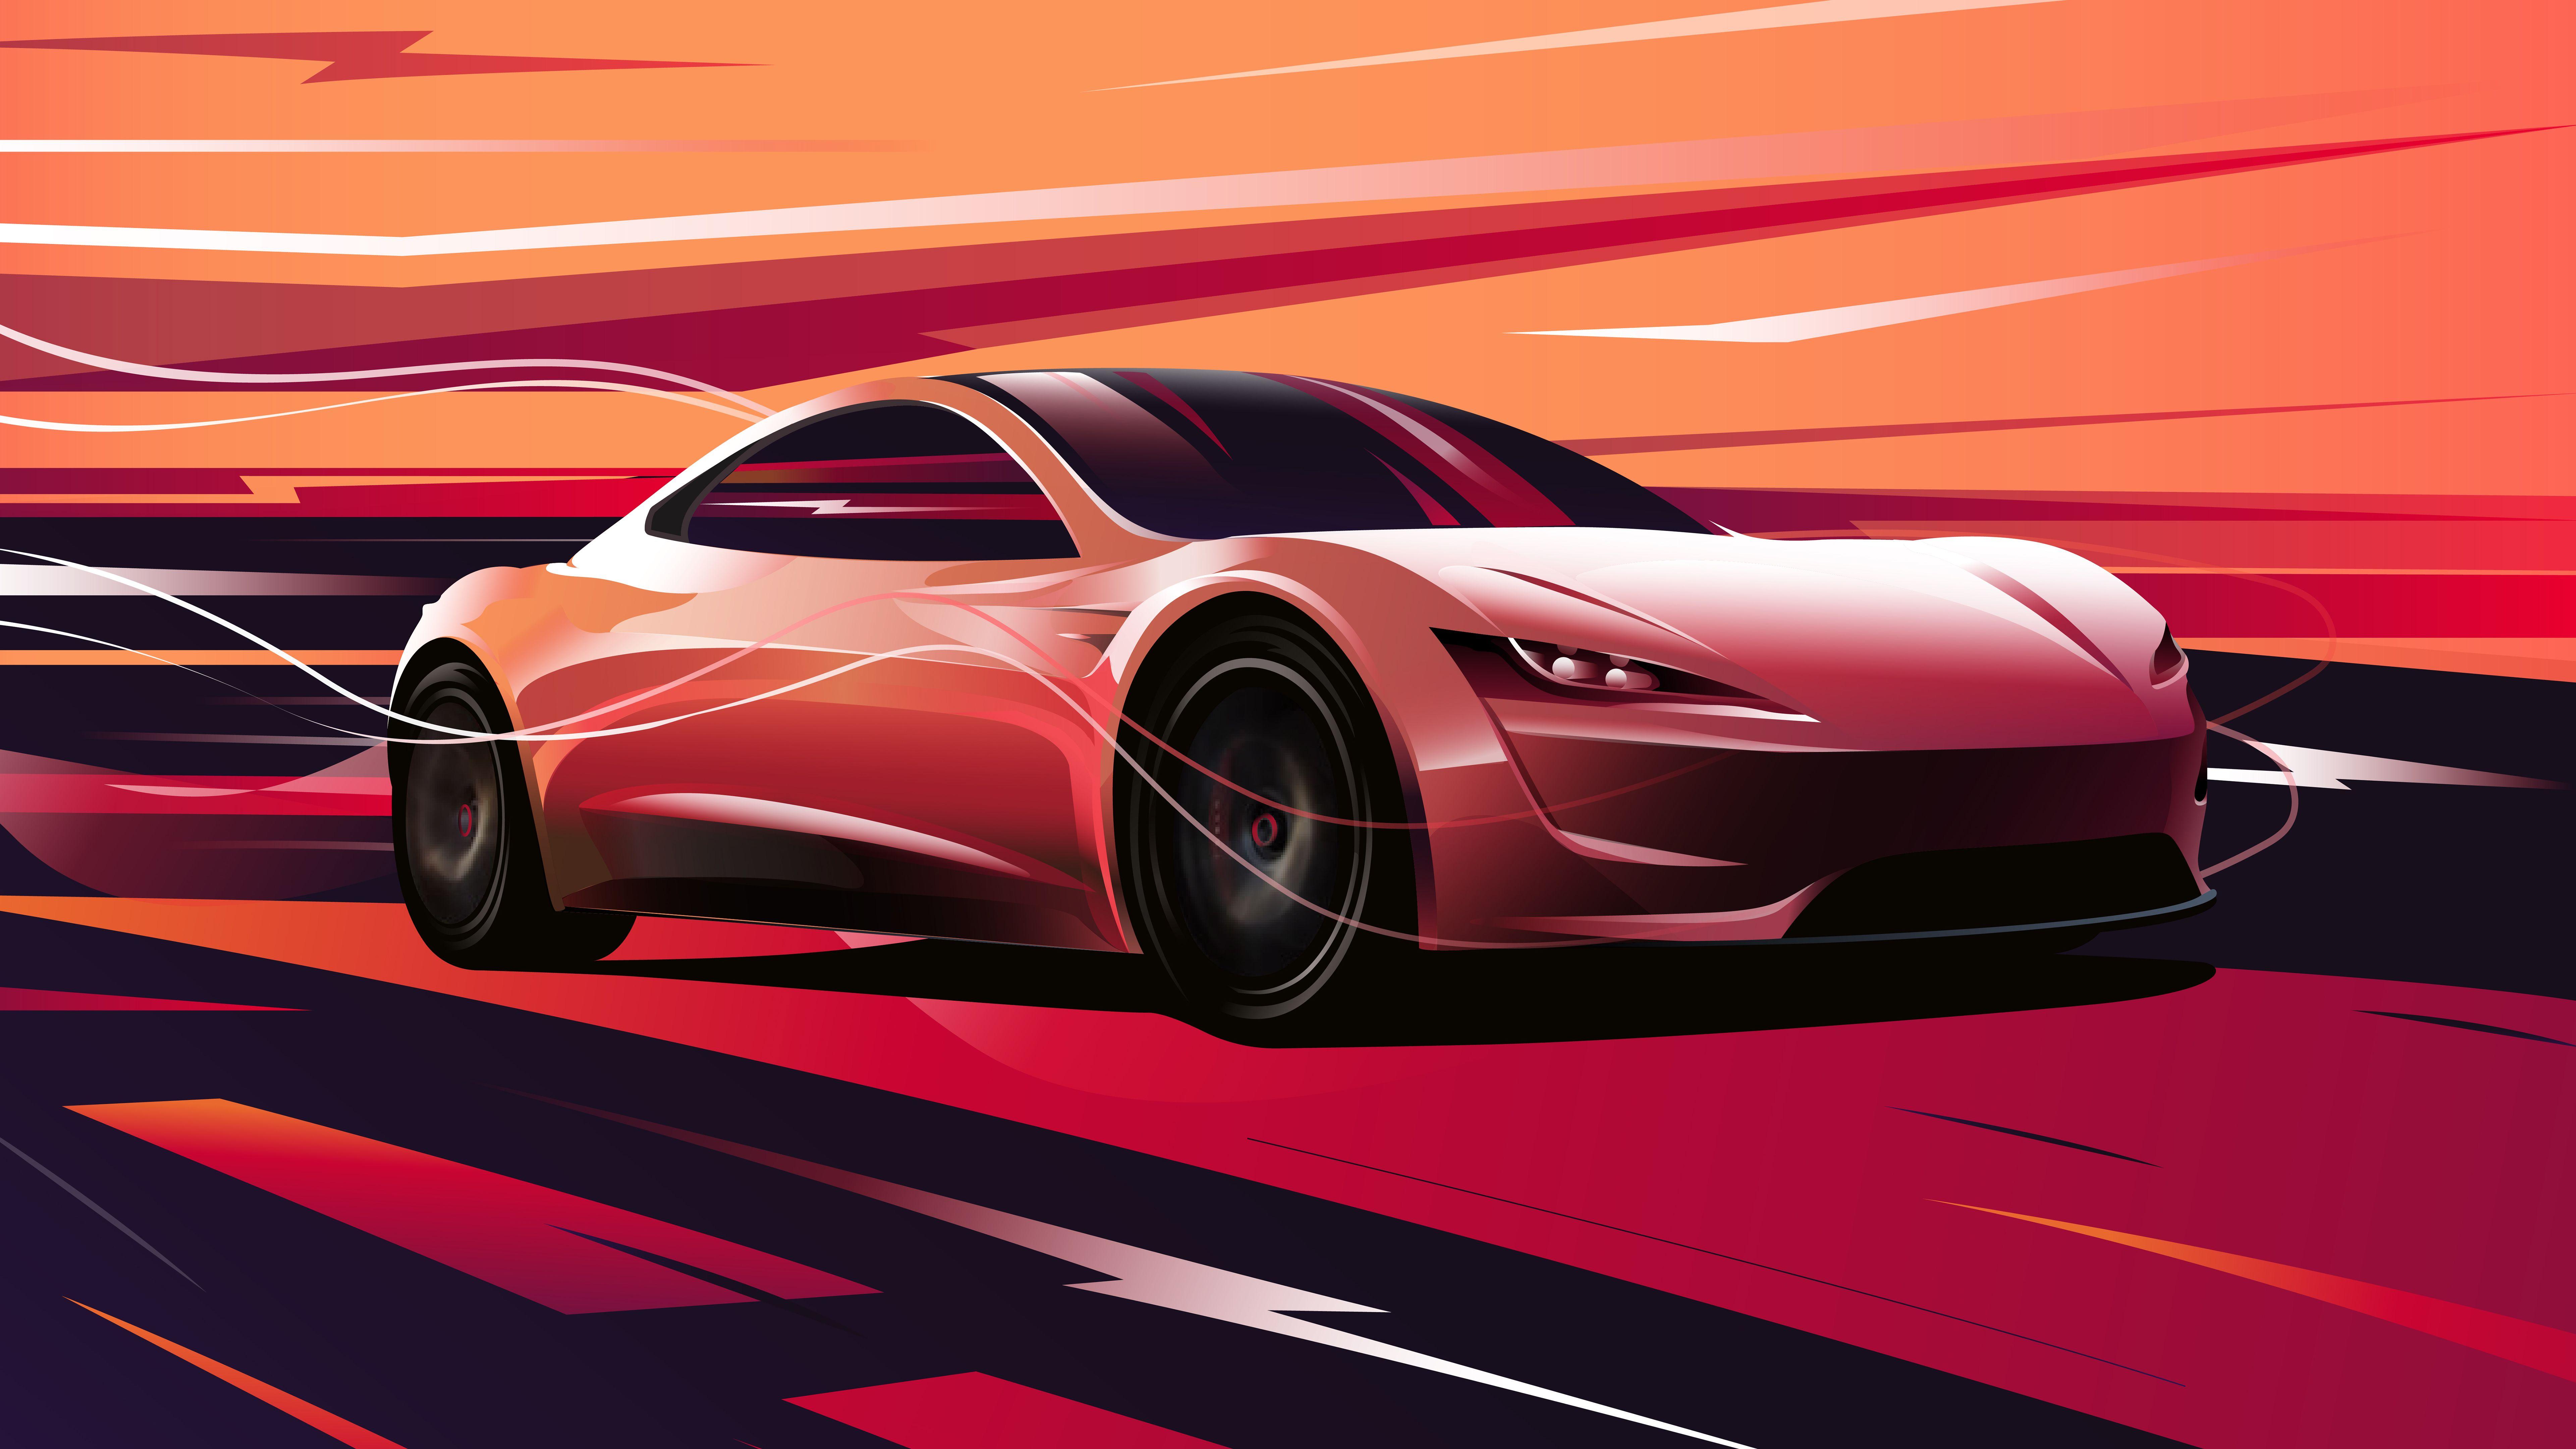 Tesla Roadster 2020 4k 8k Tesla Roadster Car Wallpapers Roadsters